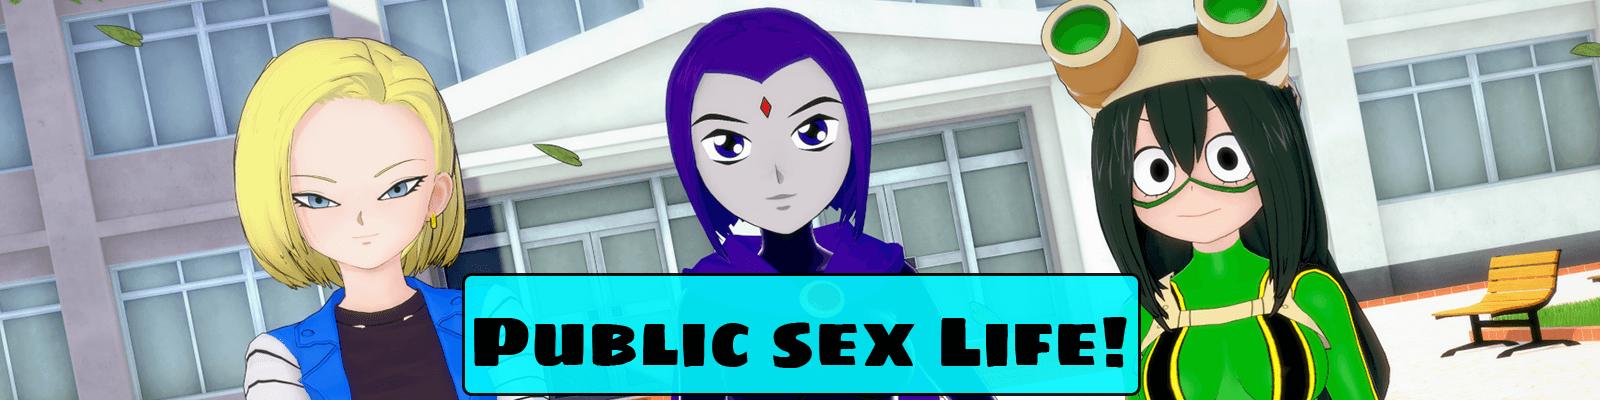 Public Sex Life [v0.31] [ParadiceZone] - VisitMama